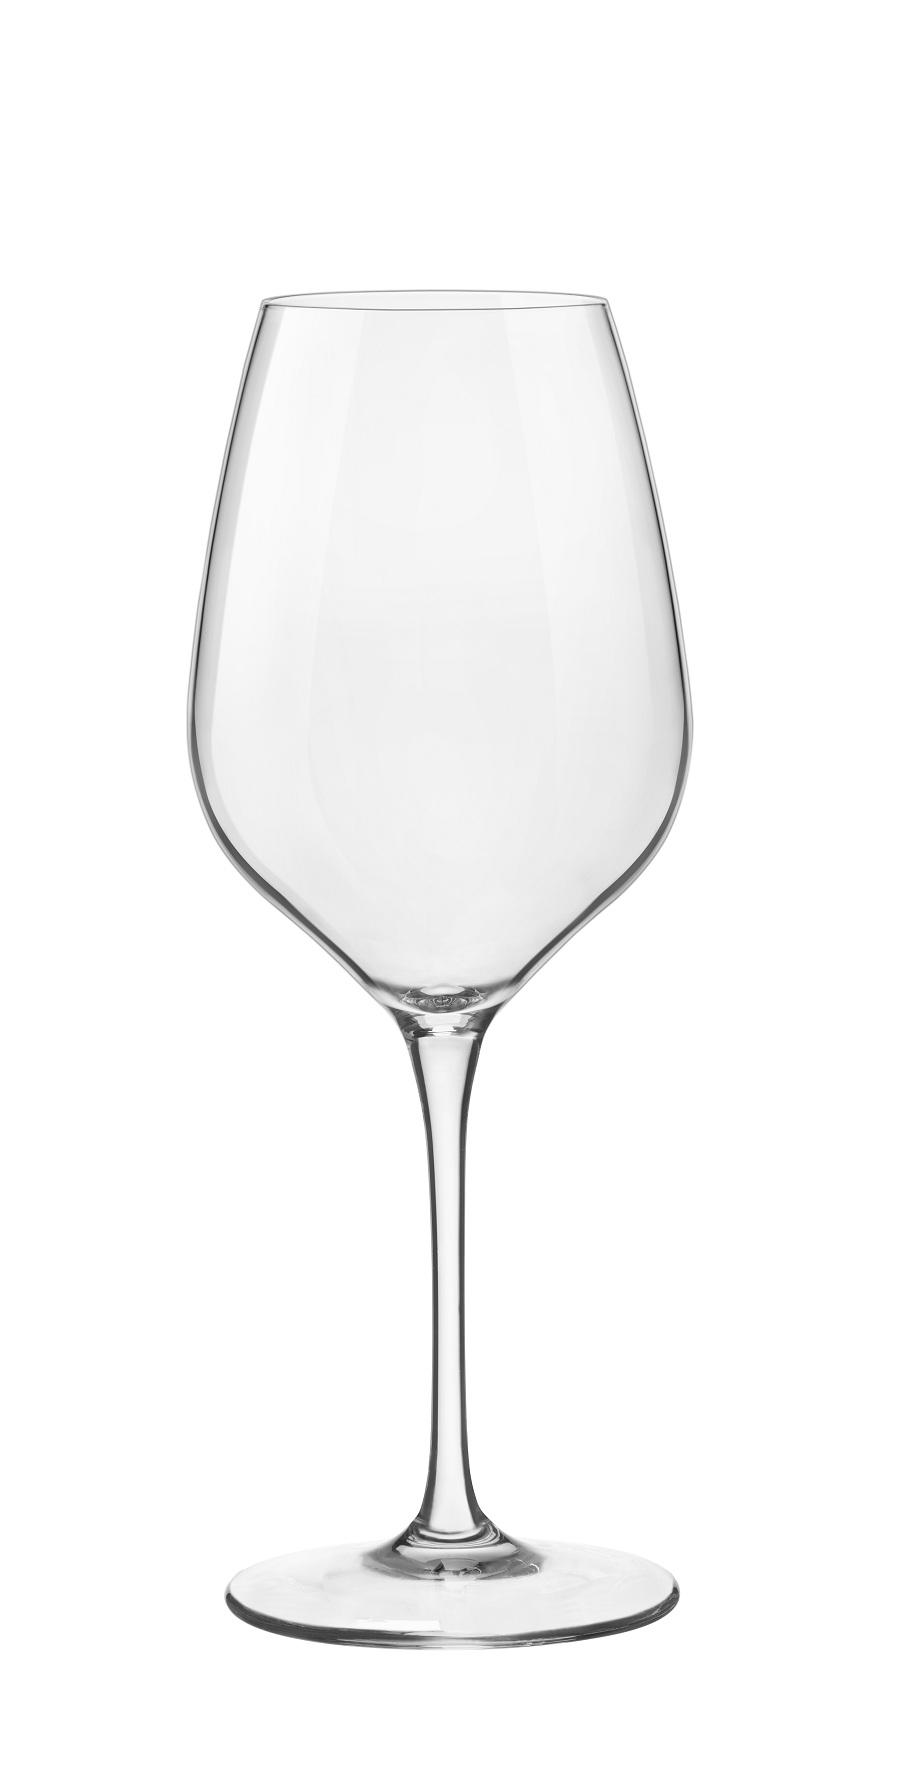 900x1789 Tre Sensi Glass Image Drinkhacker